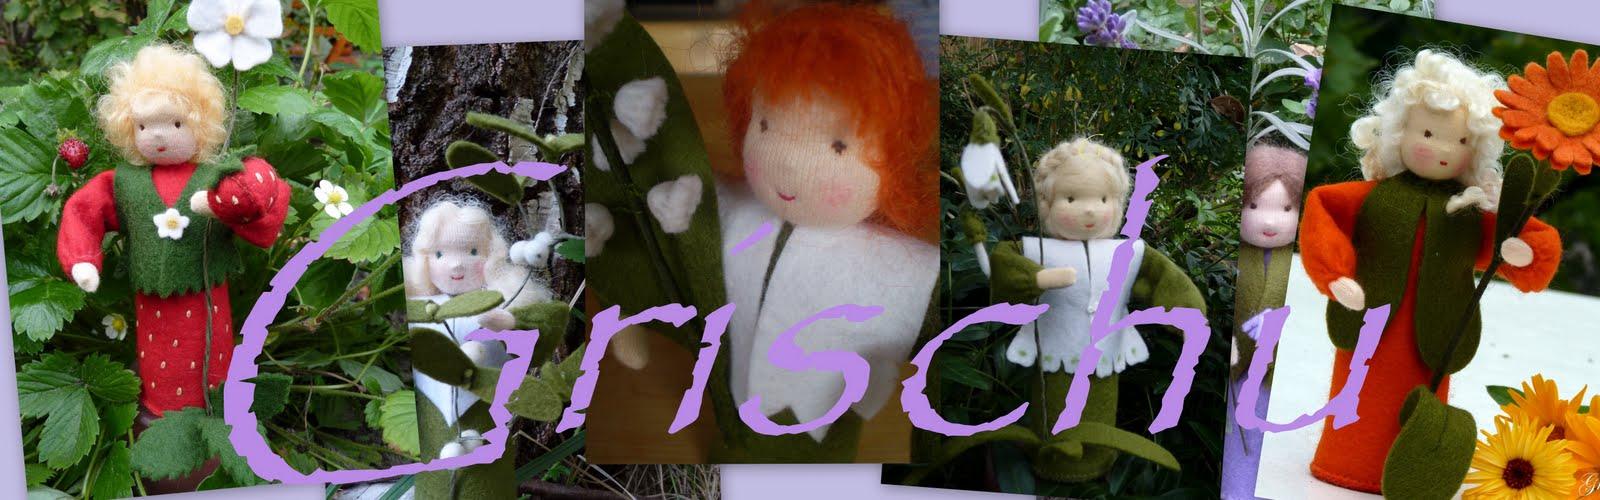 Grischu